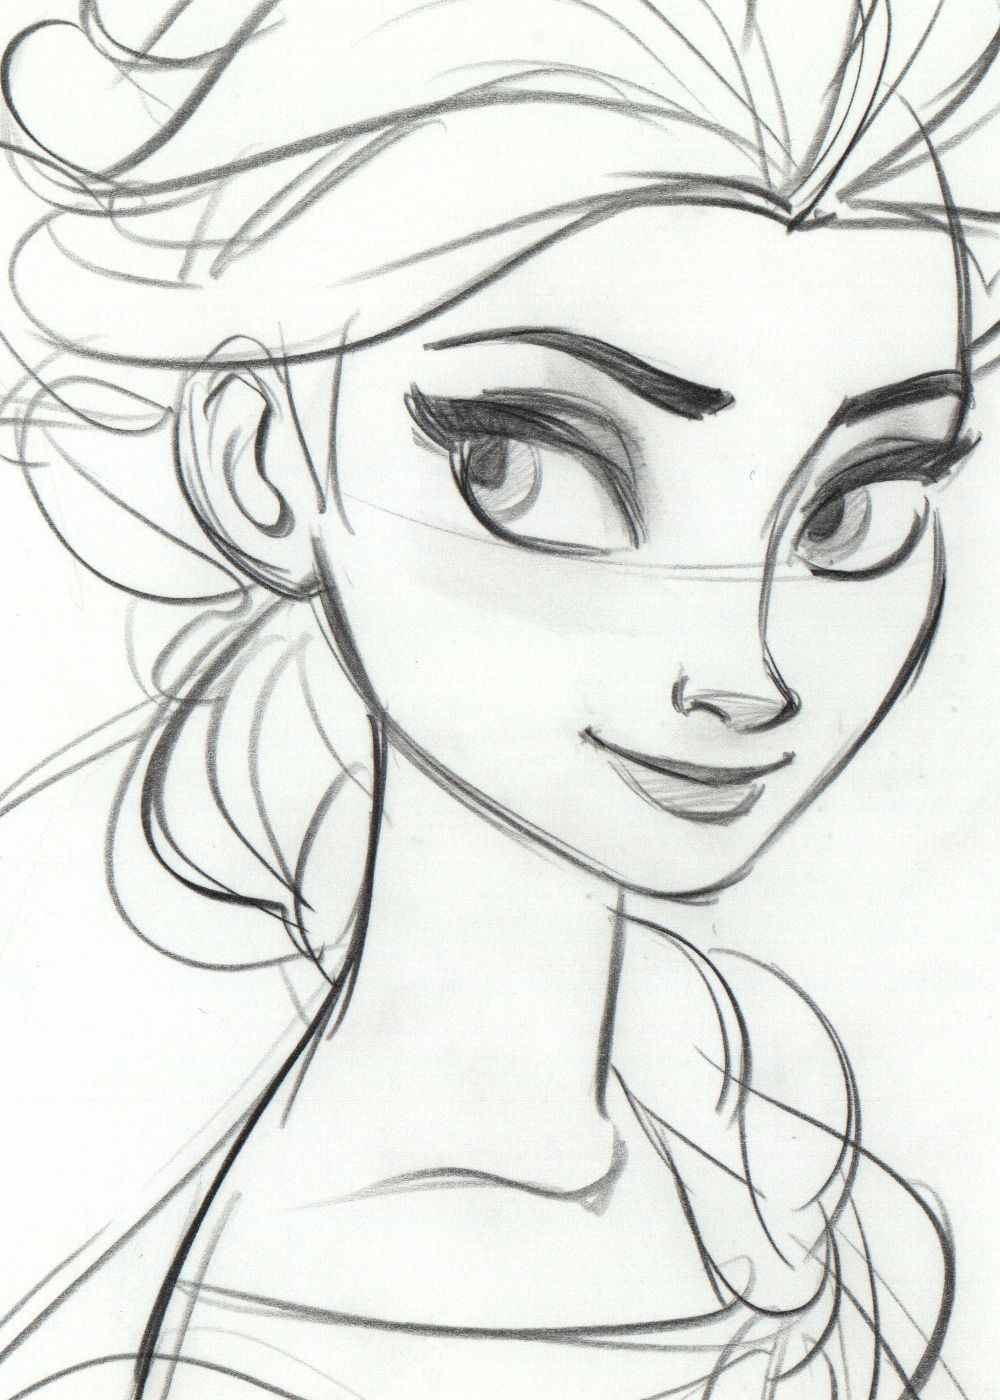 Drawings Of Disney Characters Frozen Google Search Disney Character Drawings Disney Sketches Cartoon Drawings